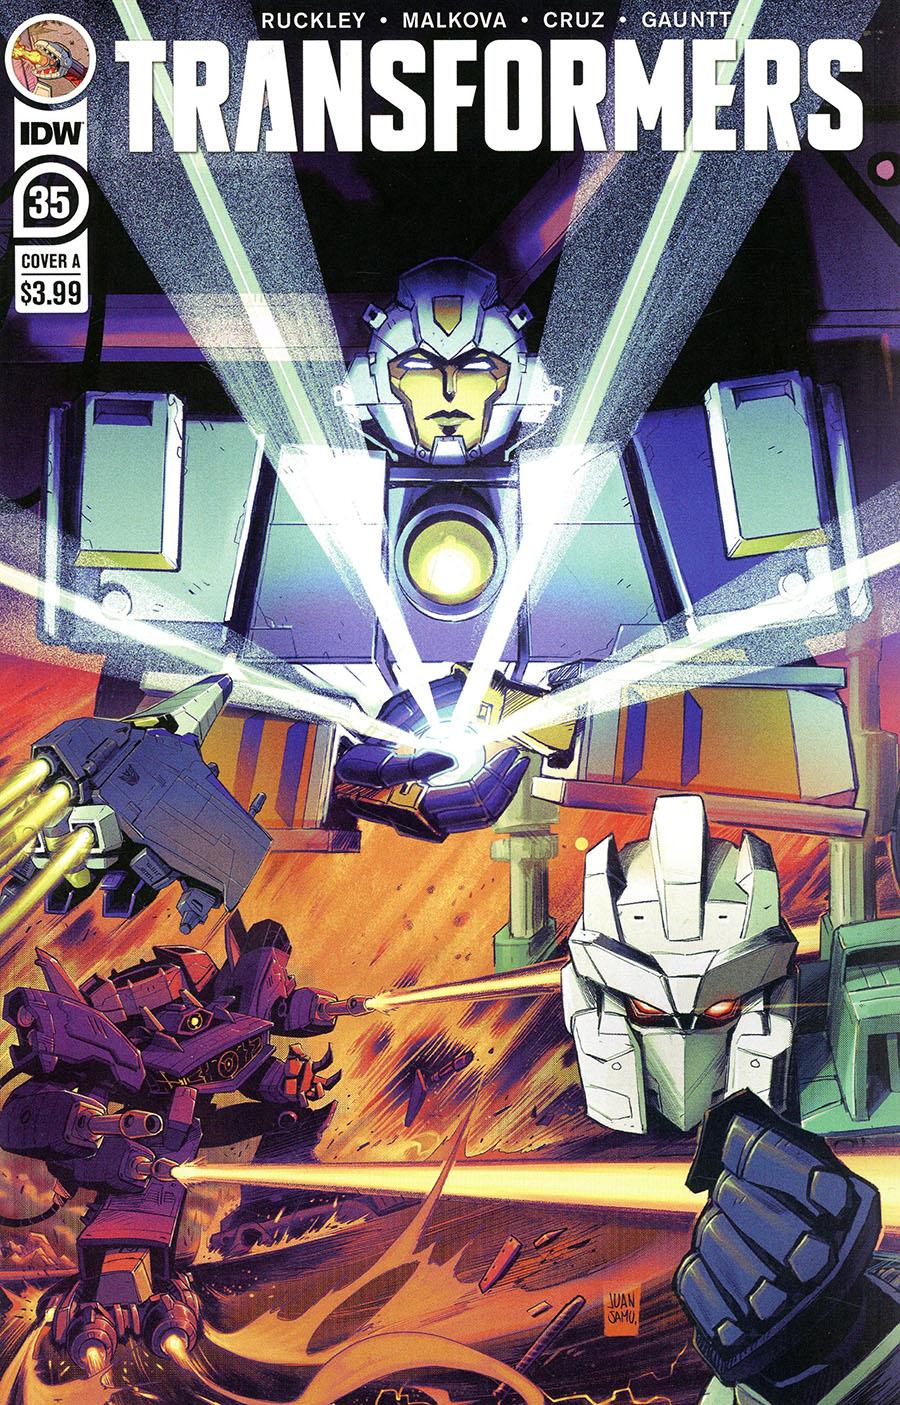 Transformers Vol 4 #35 Cover A Regular Juan Samu Cover